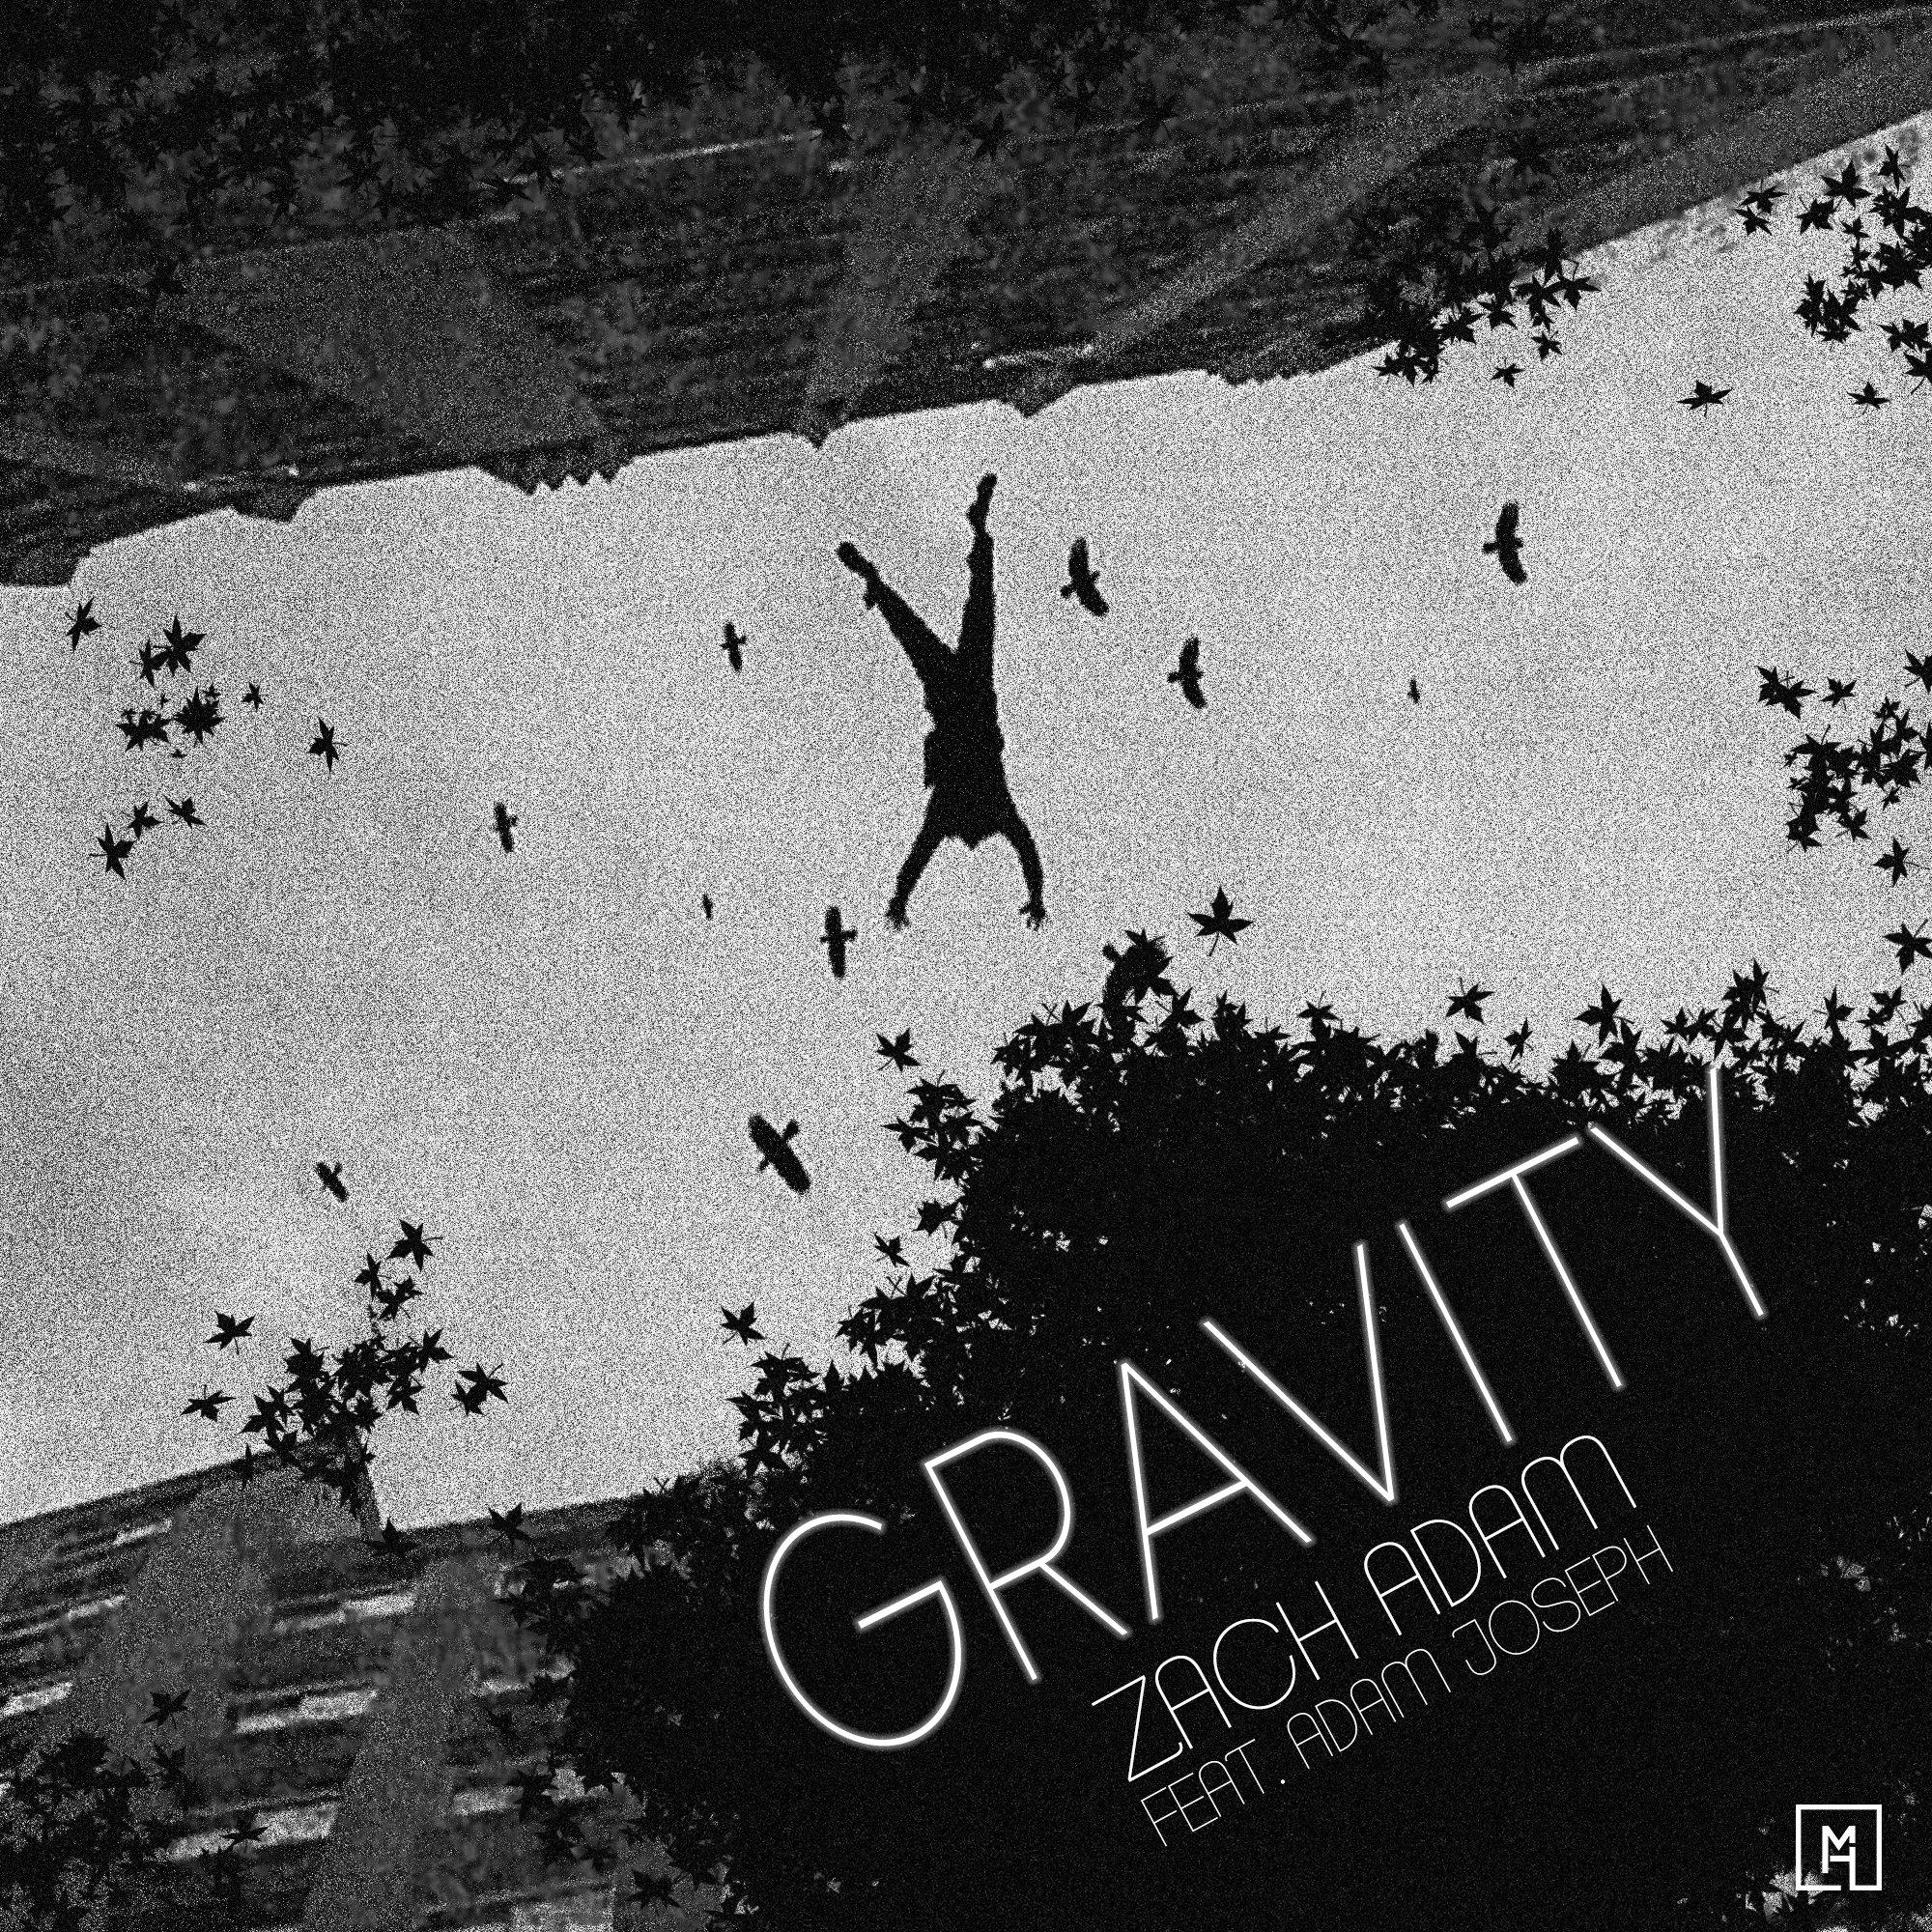 Zach Adam - Gravity ft. Adam Joseph